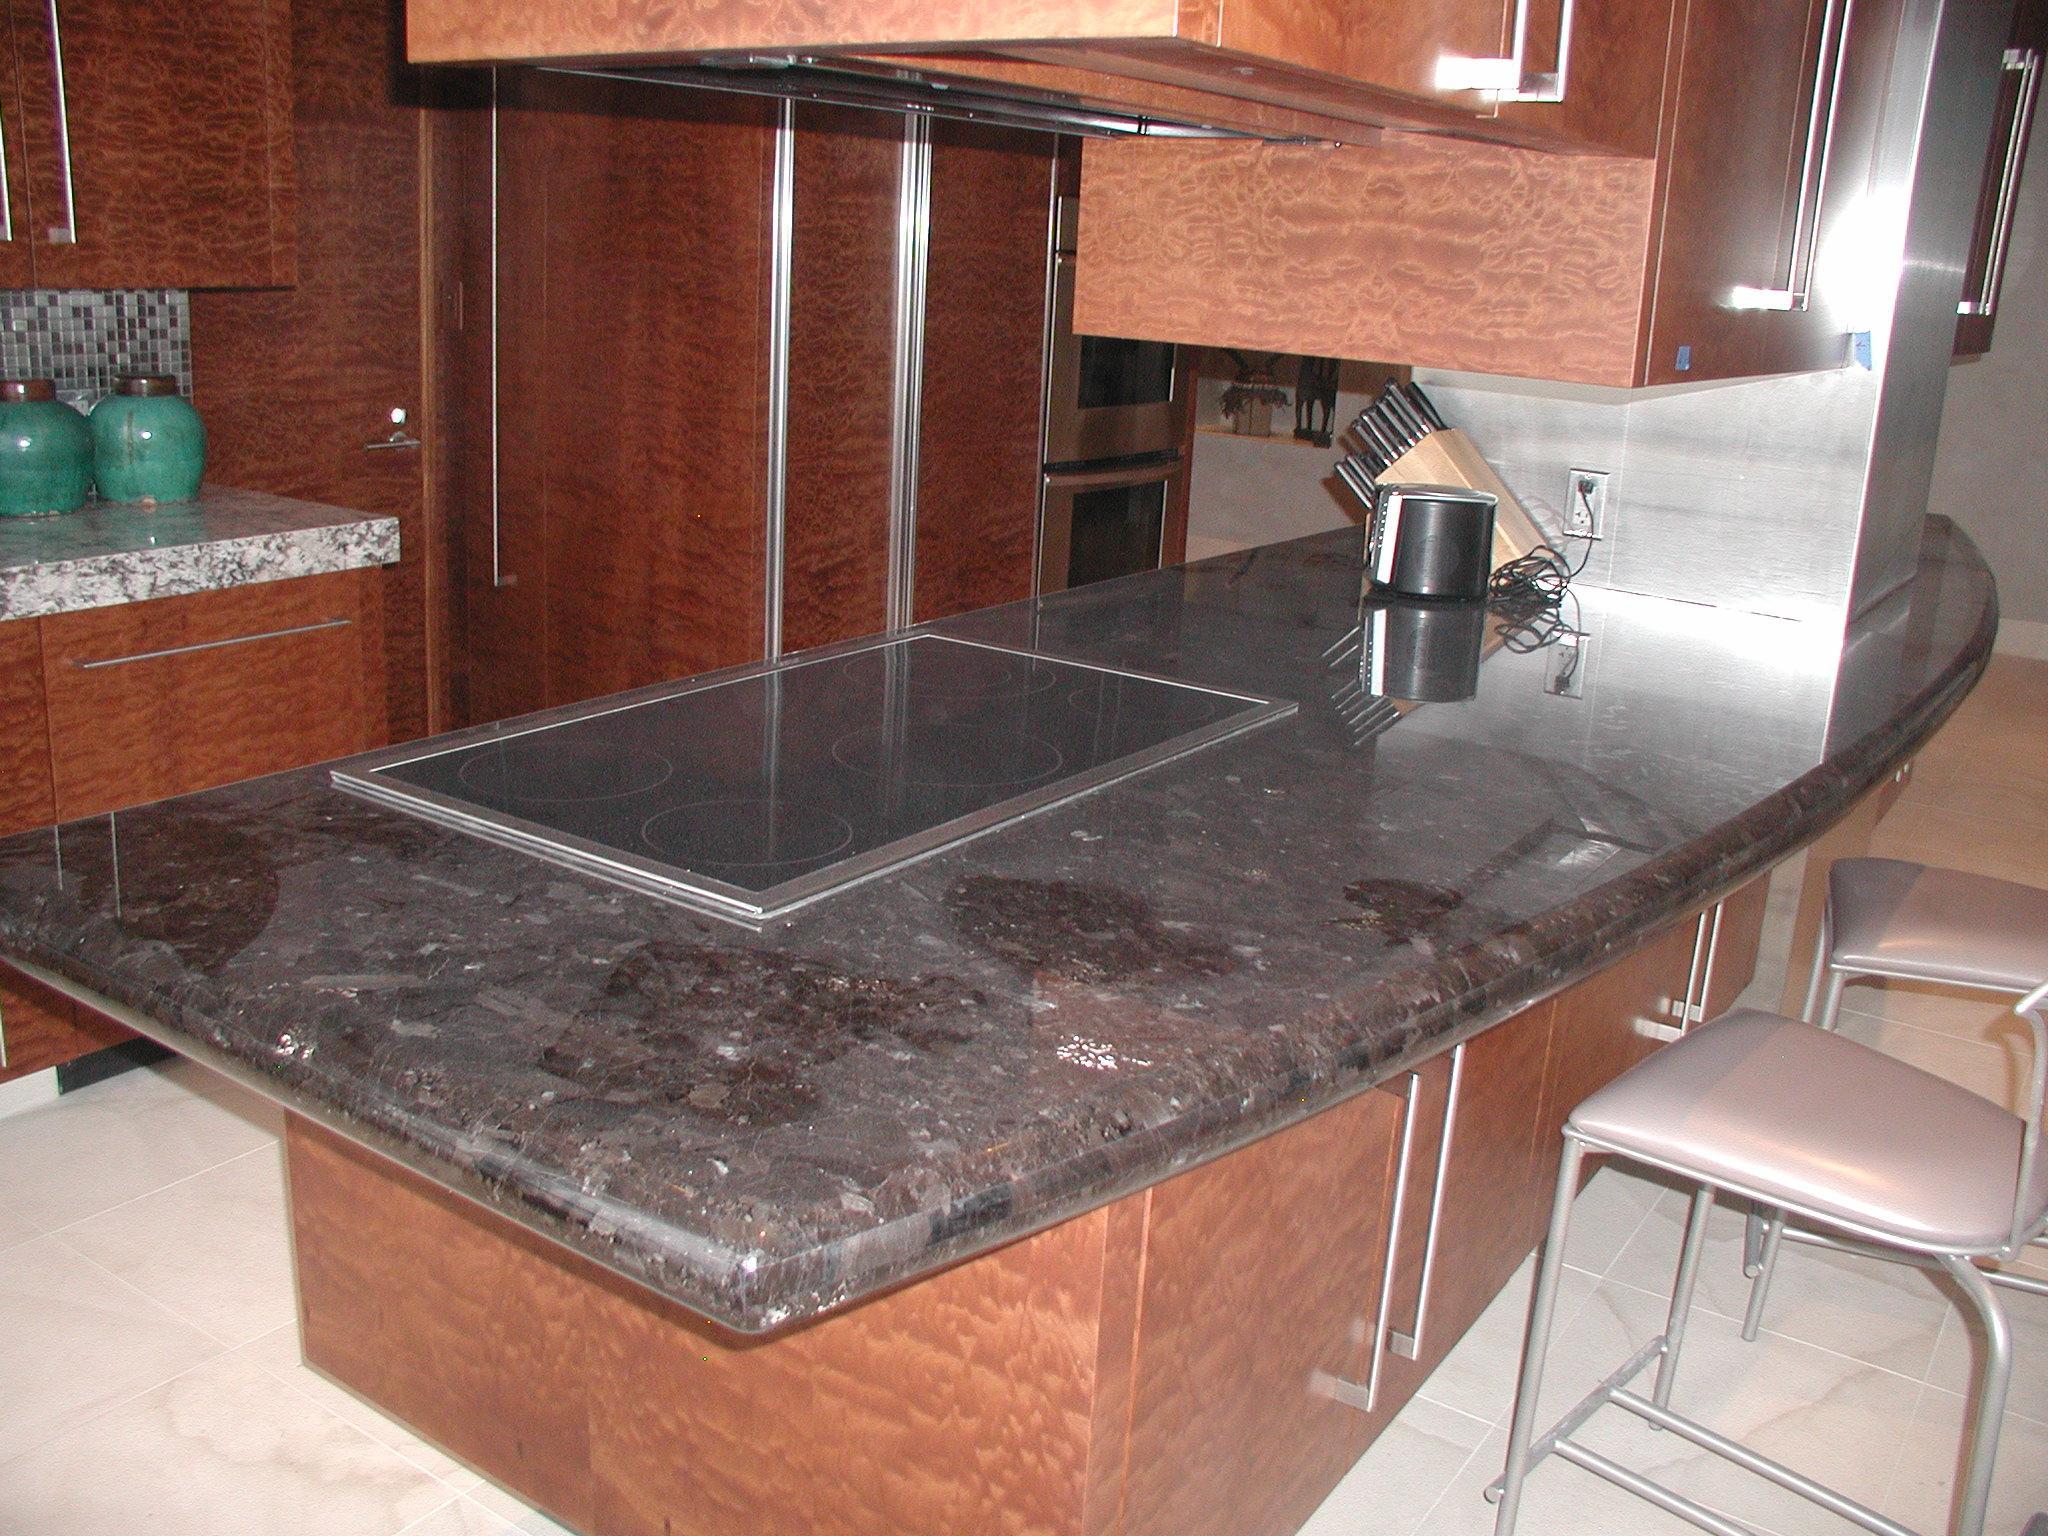 Corner Stove Home Design Kitchen Island Kitchen Island Cook Kitchen Design Photos S Microwave Kitchen Island Stove Or Sink Stove Kitchen Island houzz-03 Kitchen Island With Stove